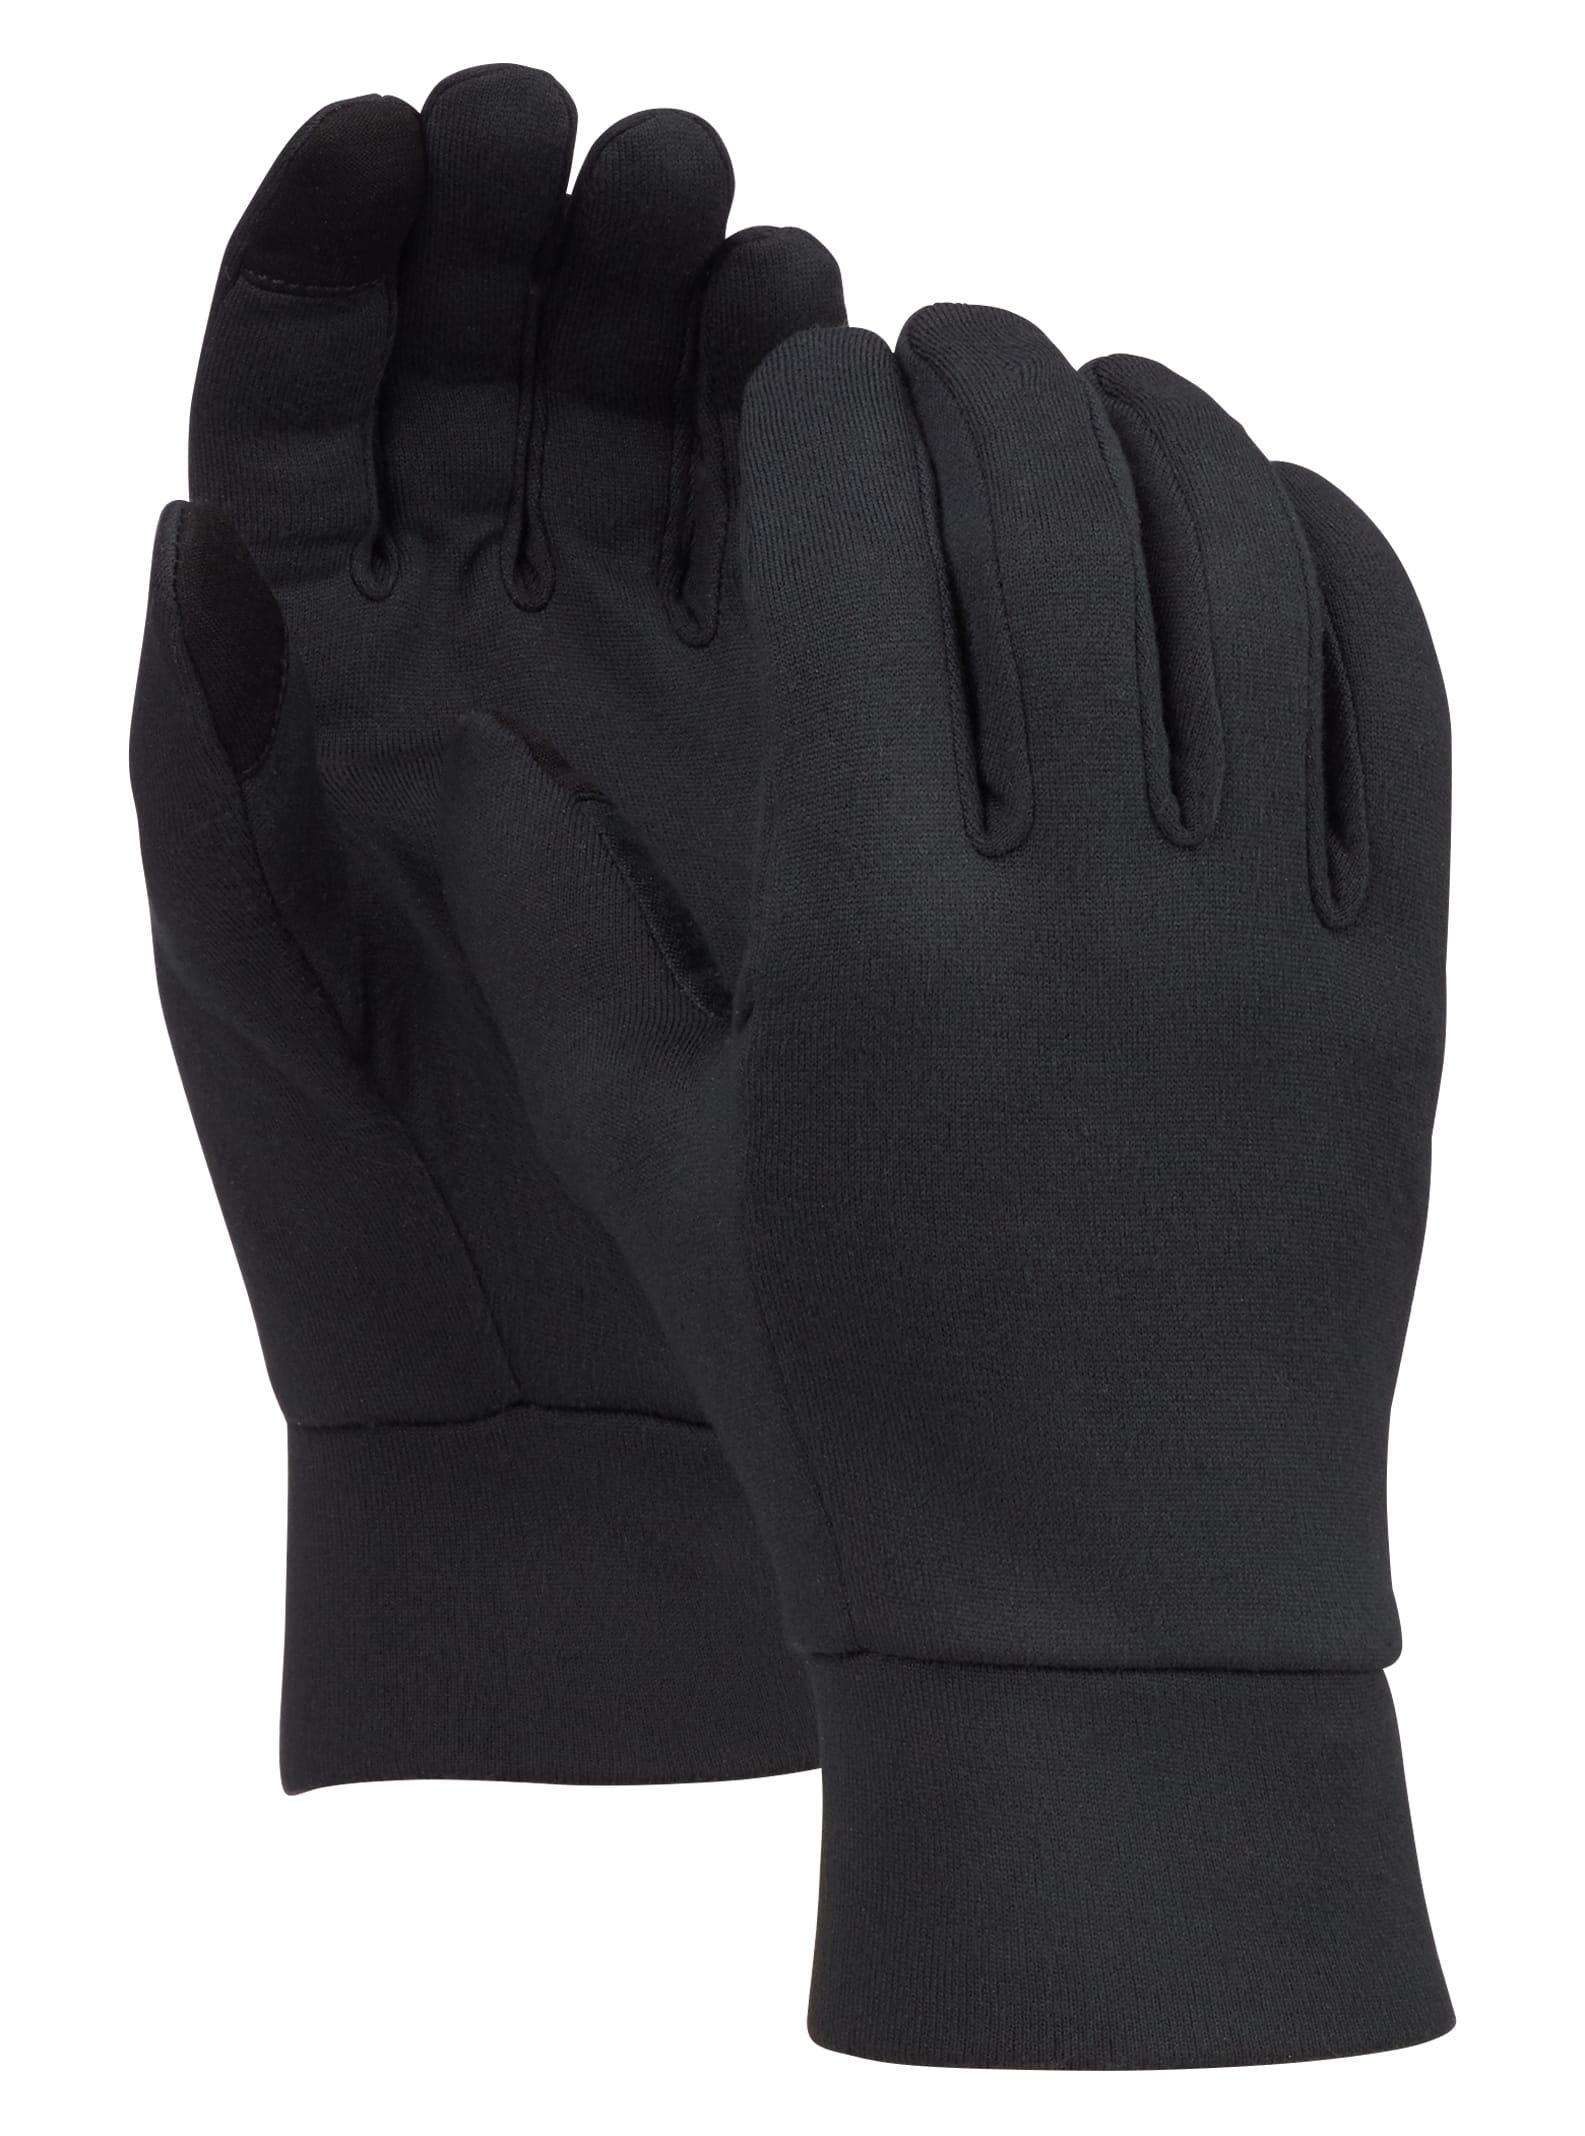 Ask Mens Black High Performance Gloves Winter Ski Snowboard Mittens